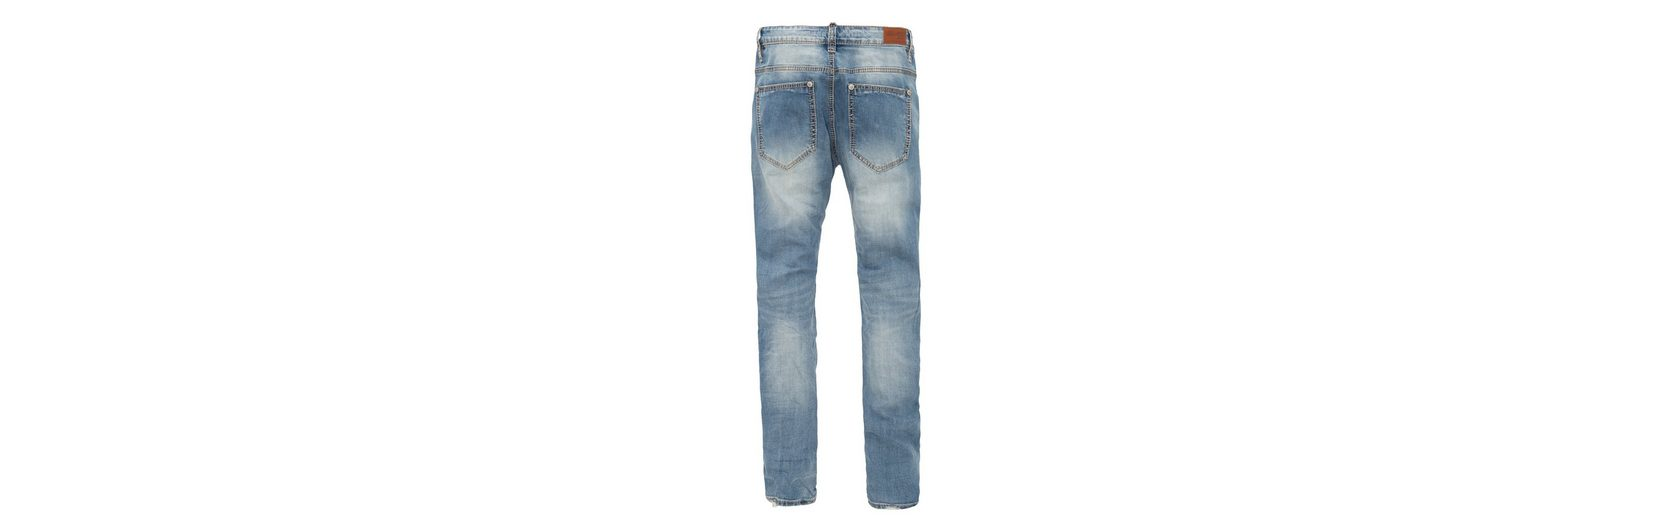 Blue Monkey Slim-fit-Jeans Jason 4395, mit breiten Kontrast Nähten